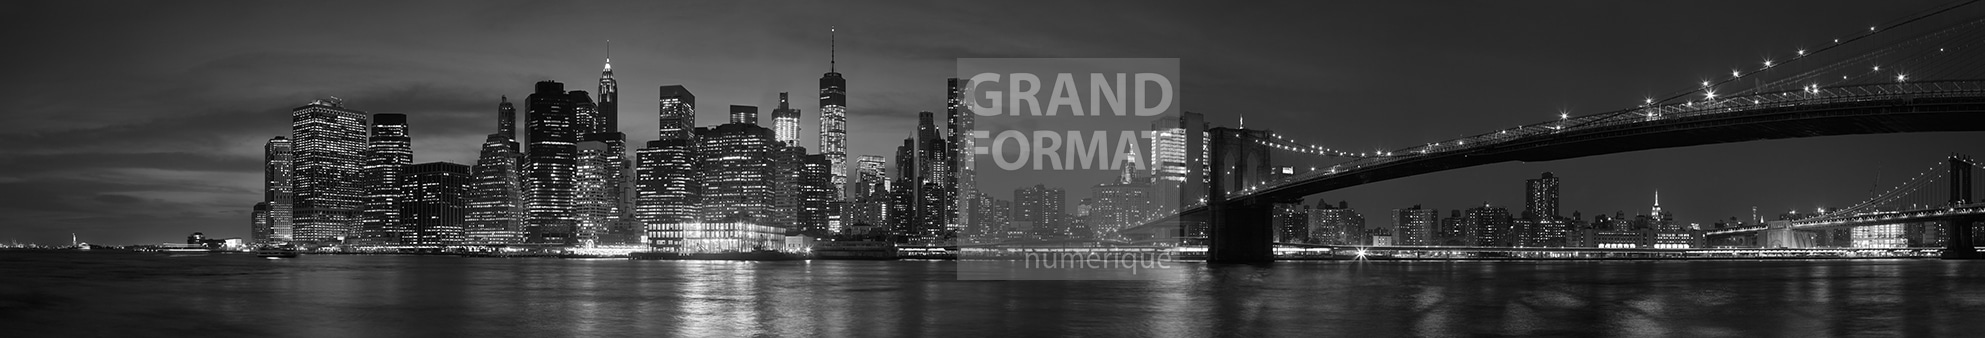 New York nuit photo impression et toile